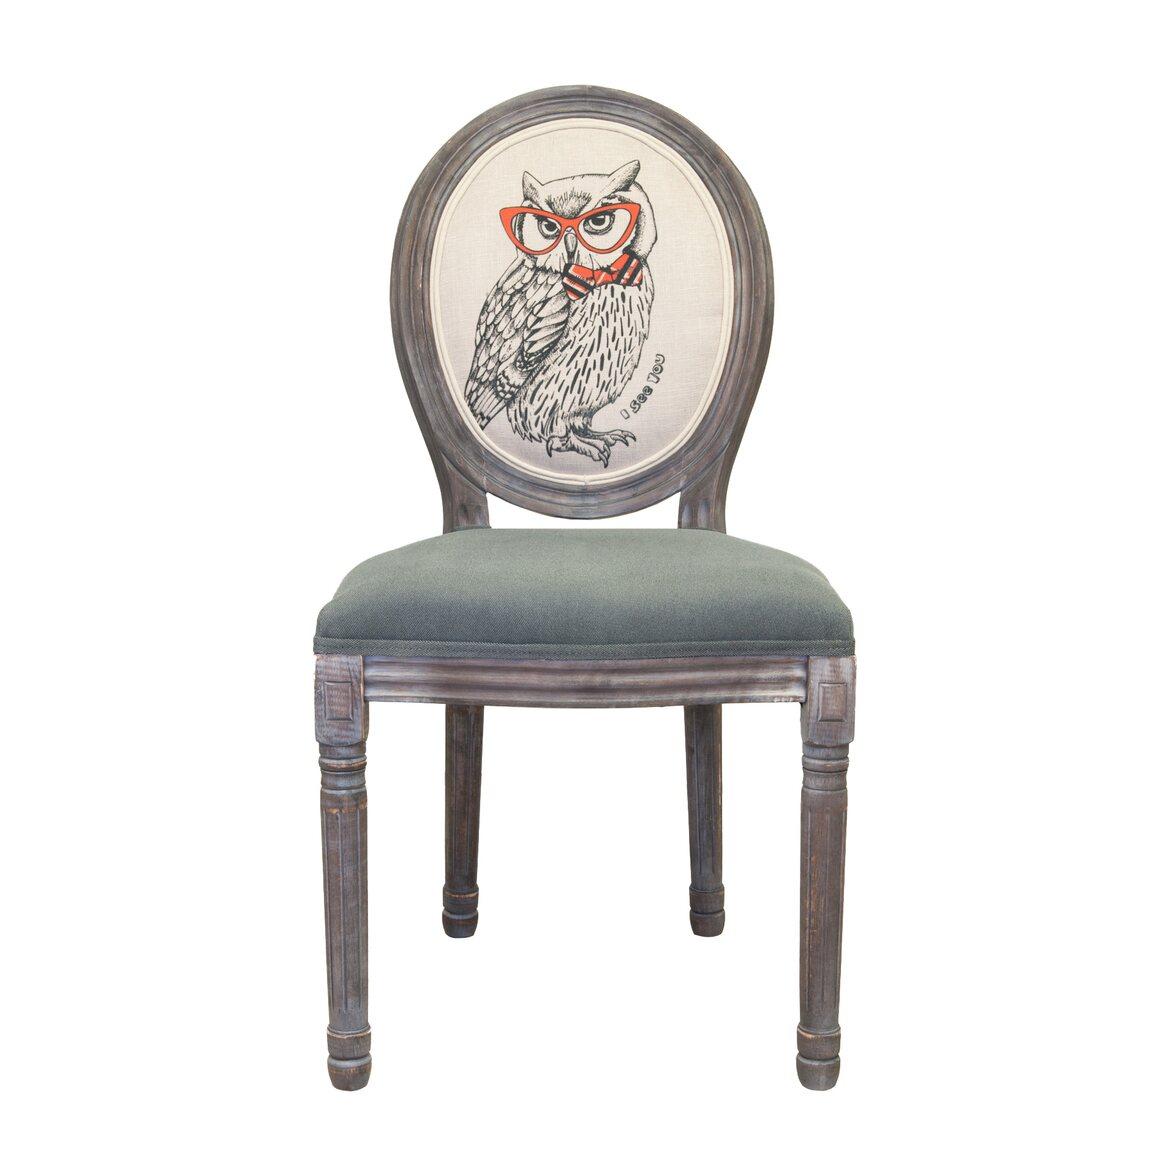 Стул Volker owl ver. 2 | Обеденные стулья Kingsby